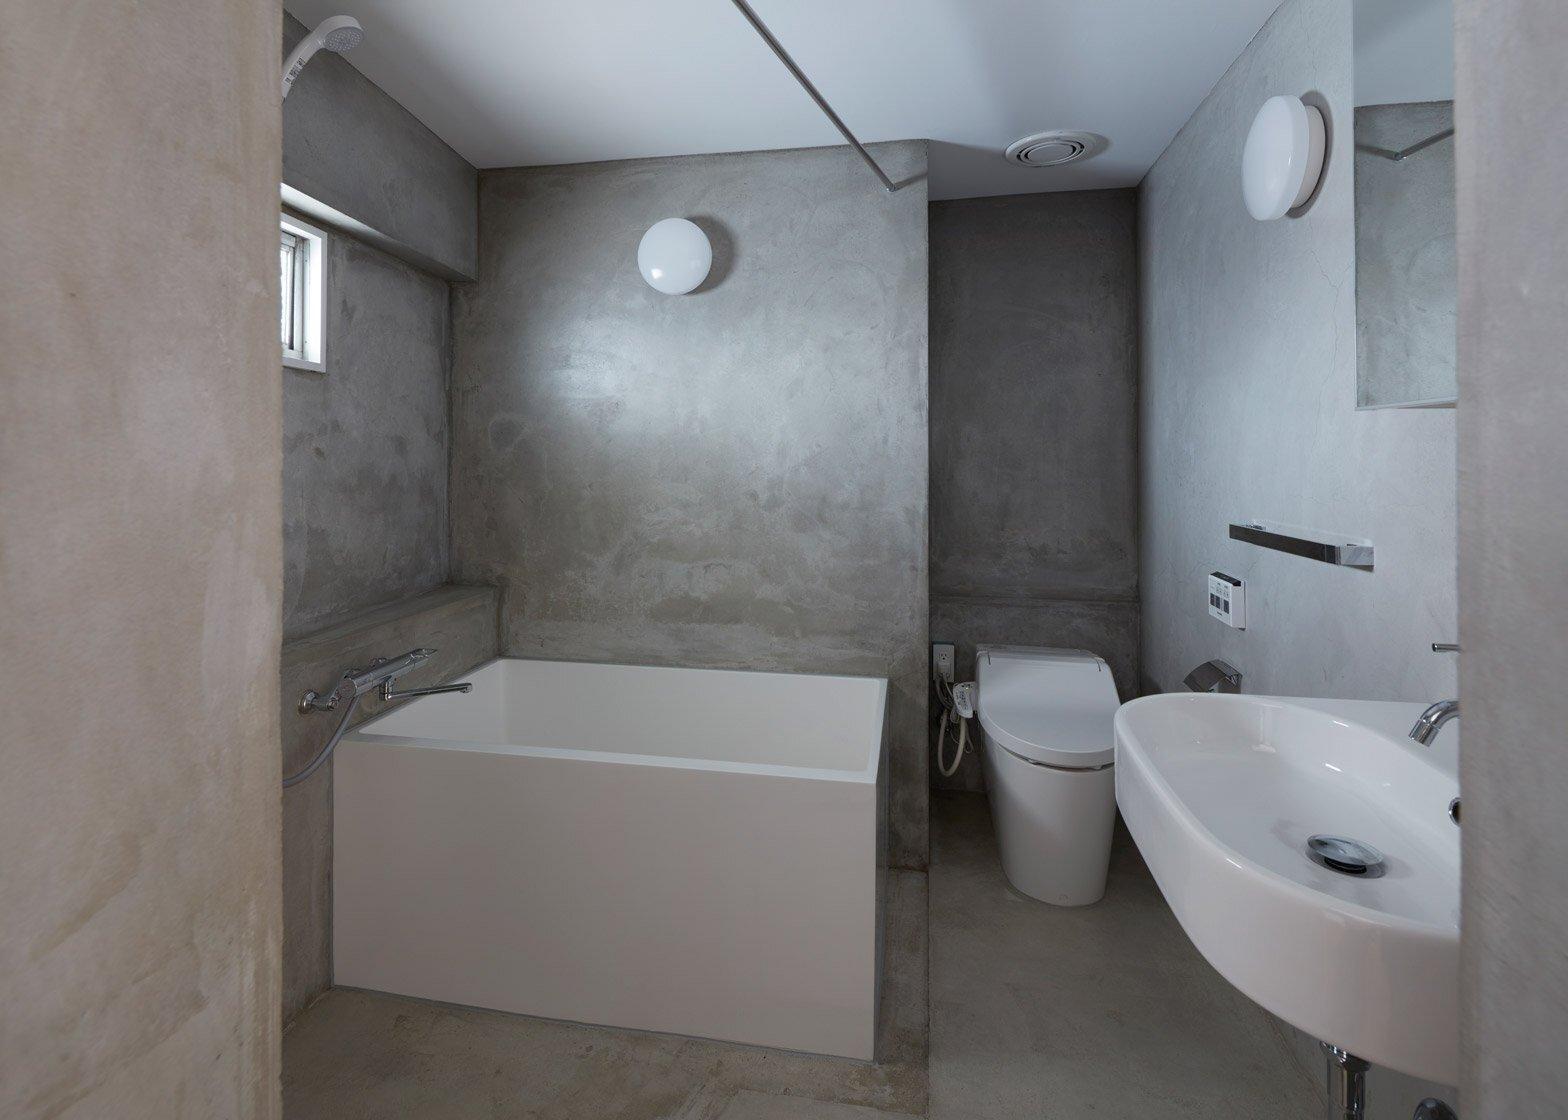 Small Apartment - FrontOfficeStudio - Tokyo - Bathroom - Humble Homes